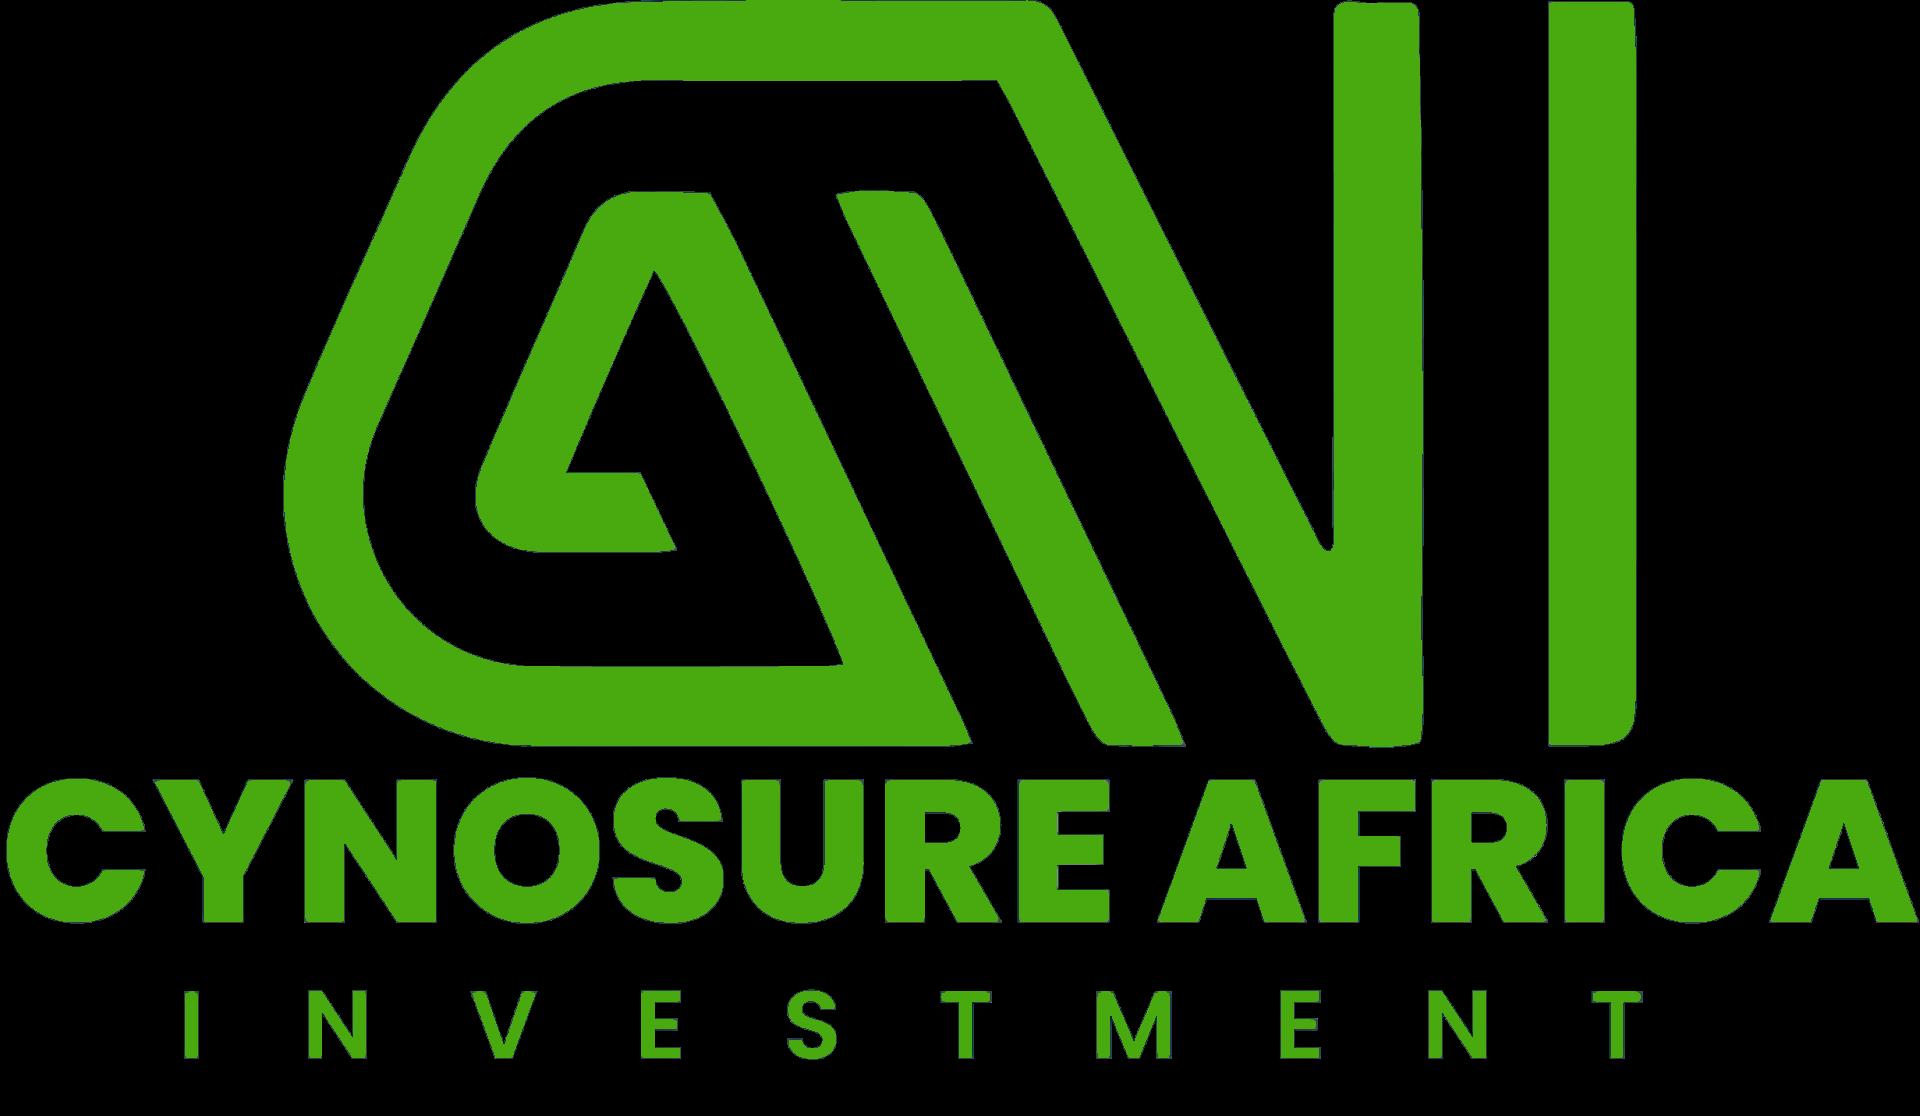 Cynosure Africa